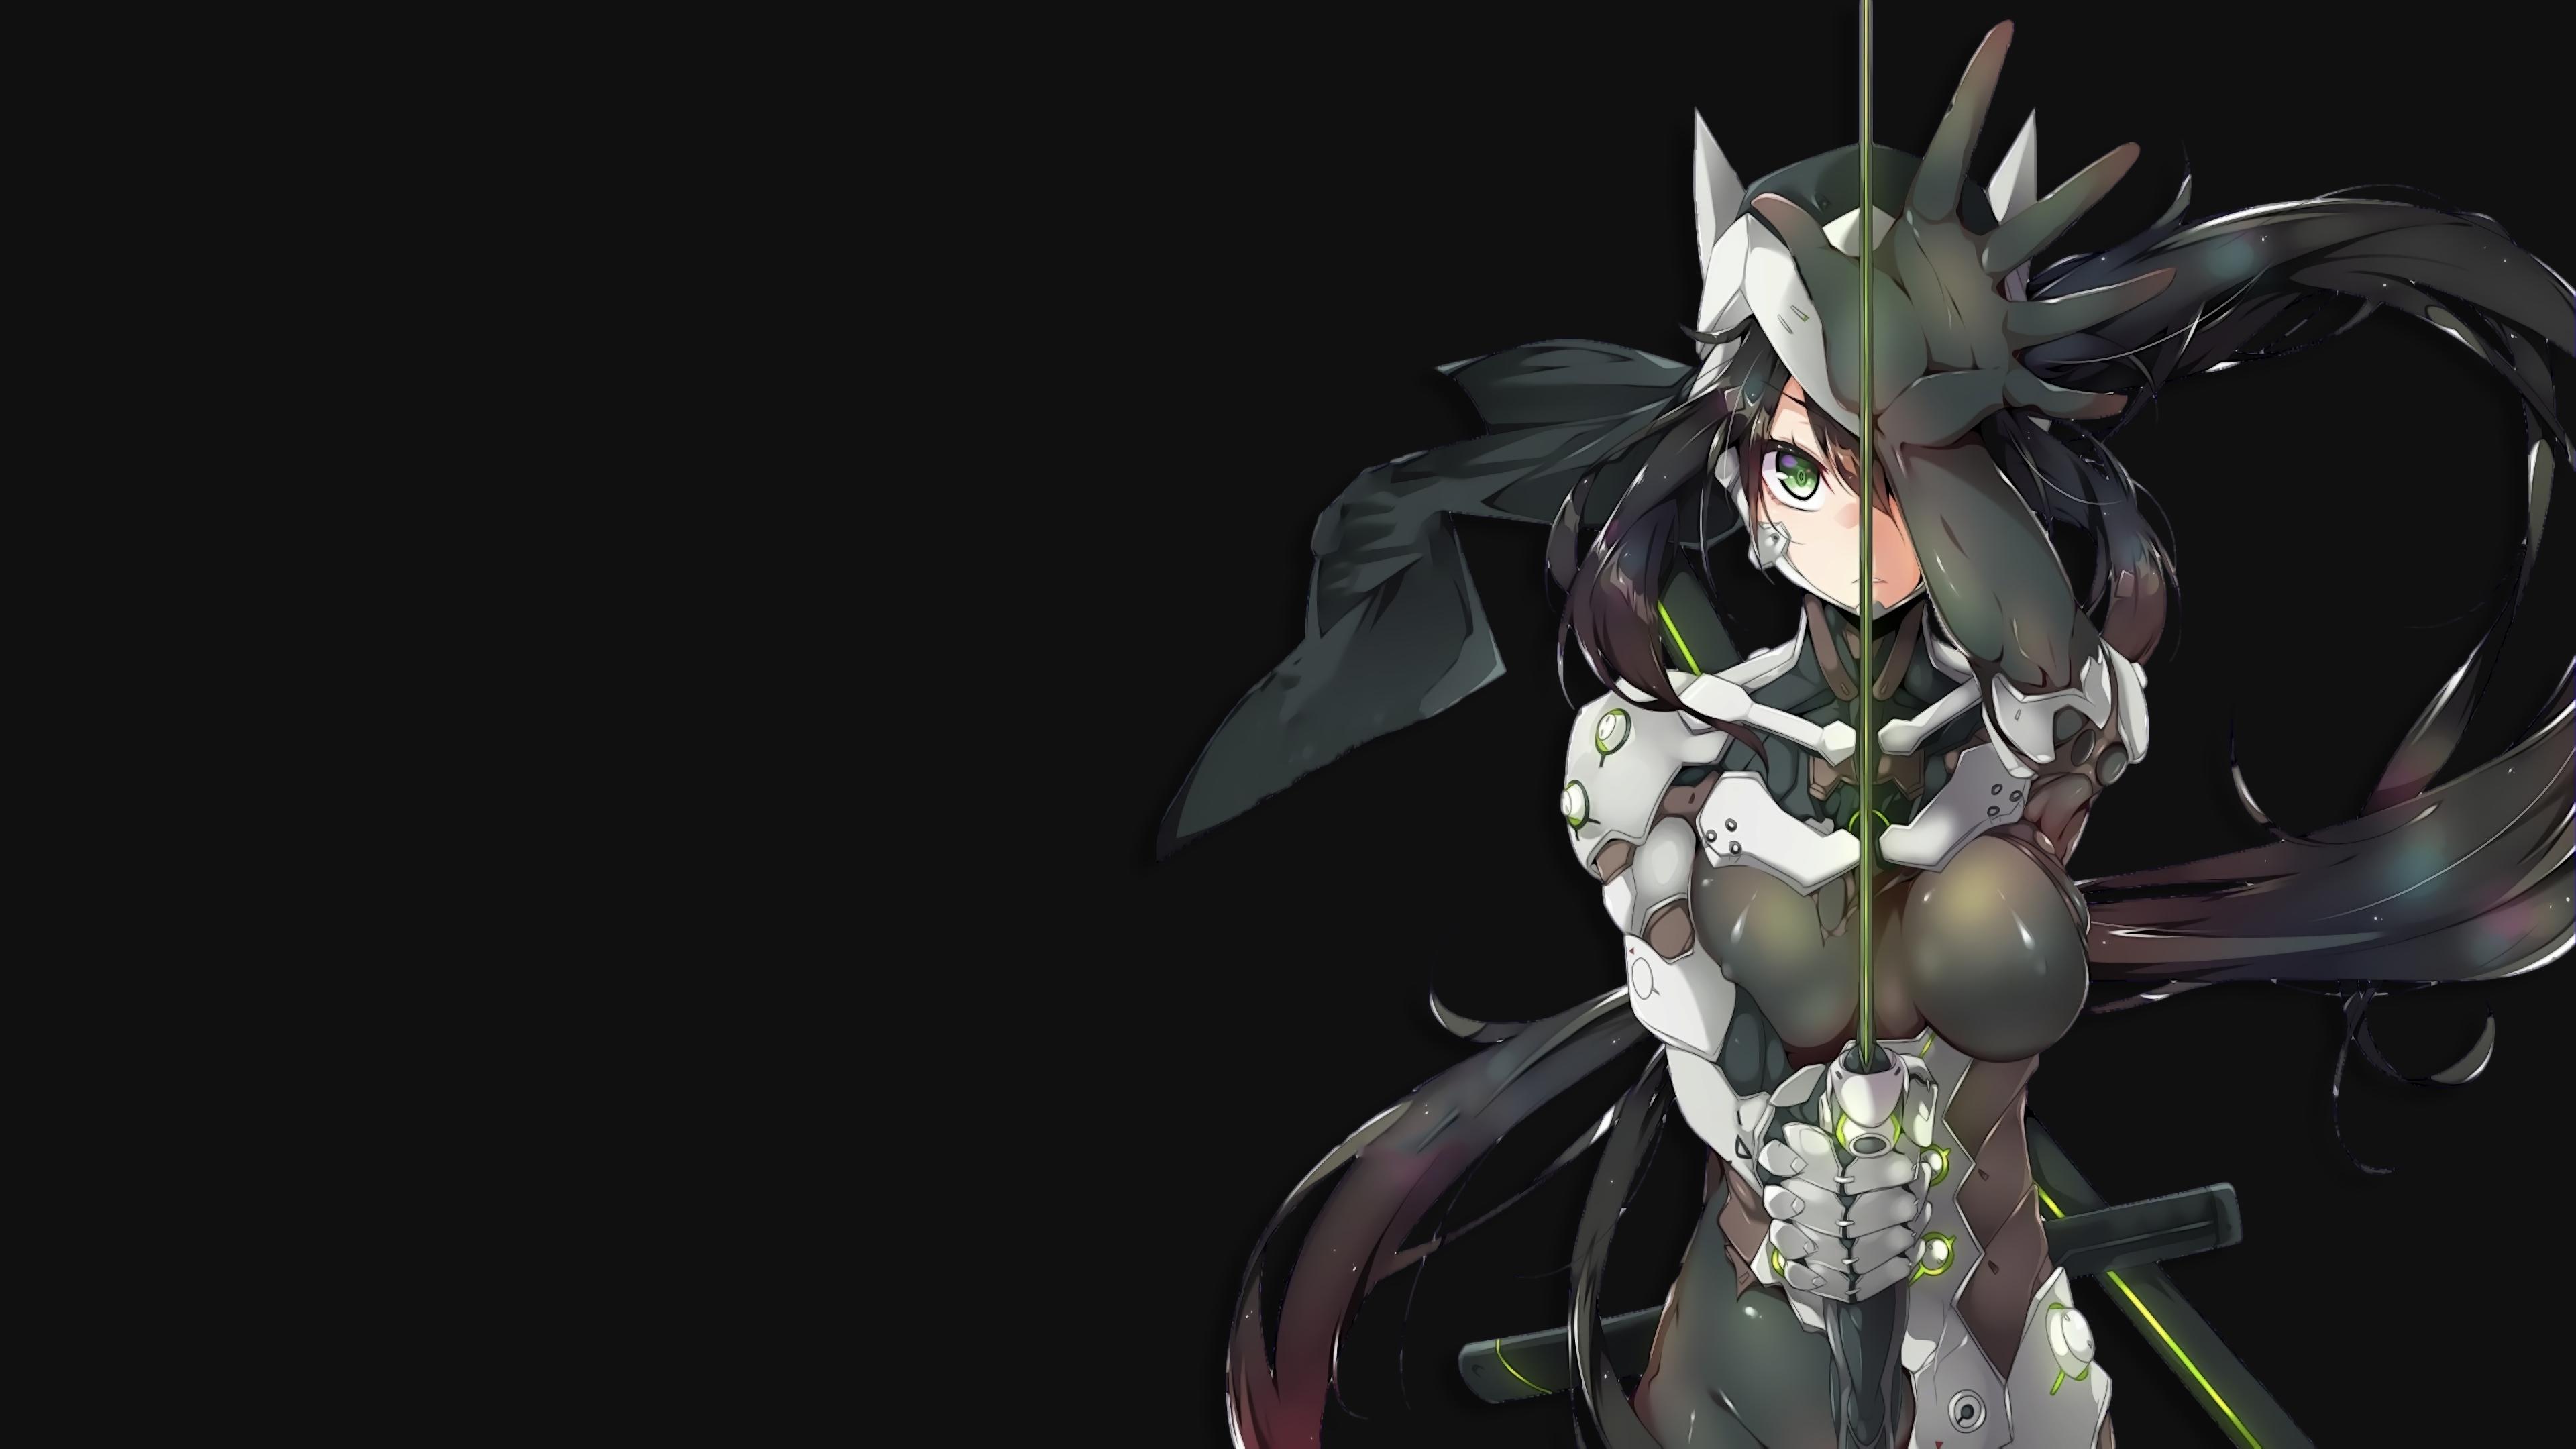 Girl Hd Wallpaper Genji Wallpaper Hd 4k 8k Overwatch